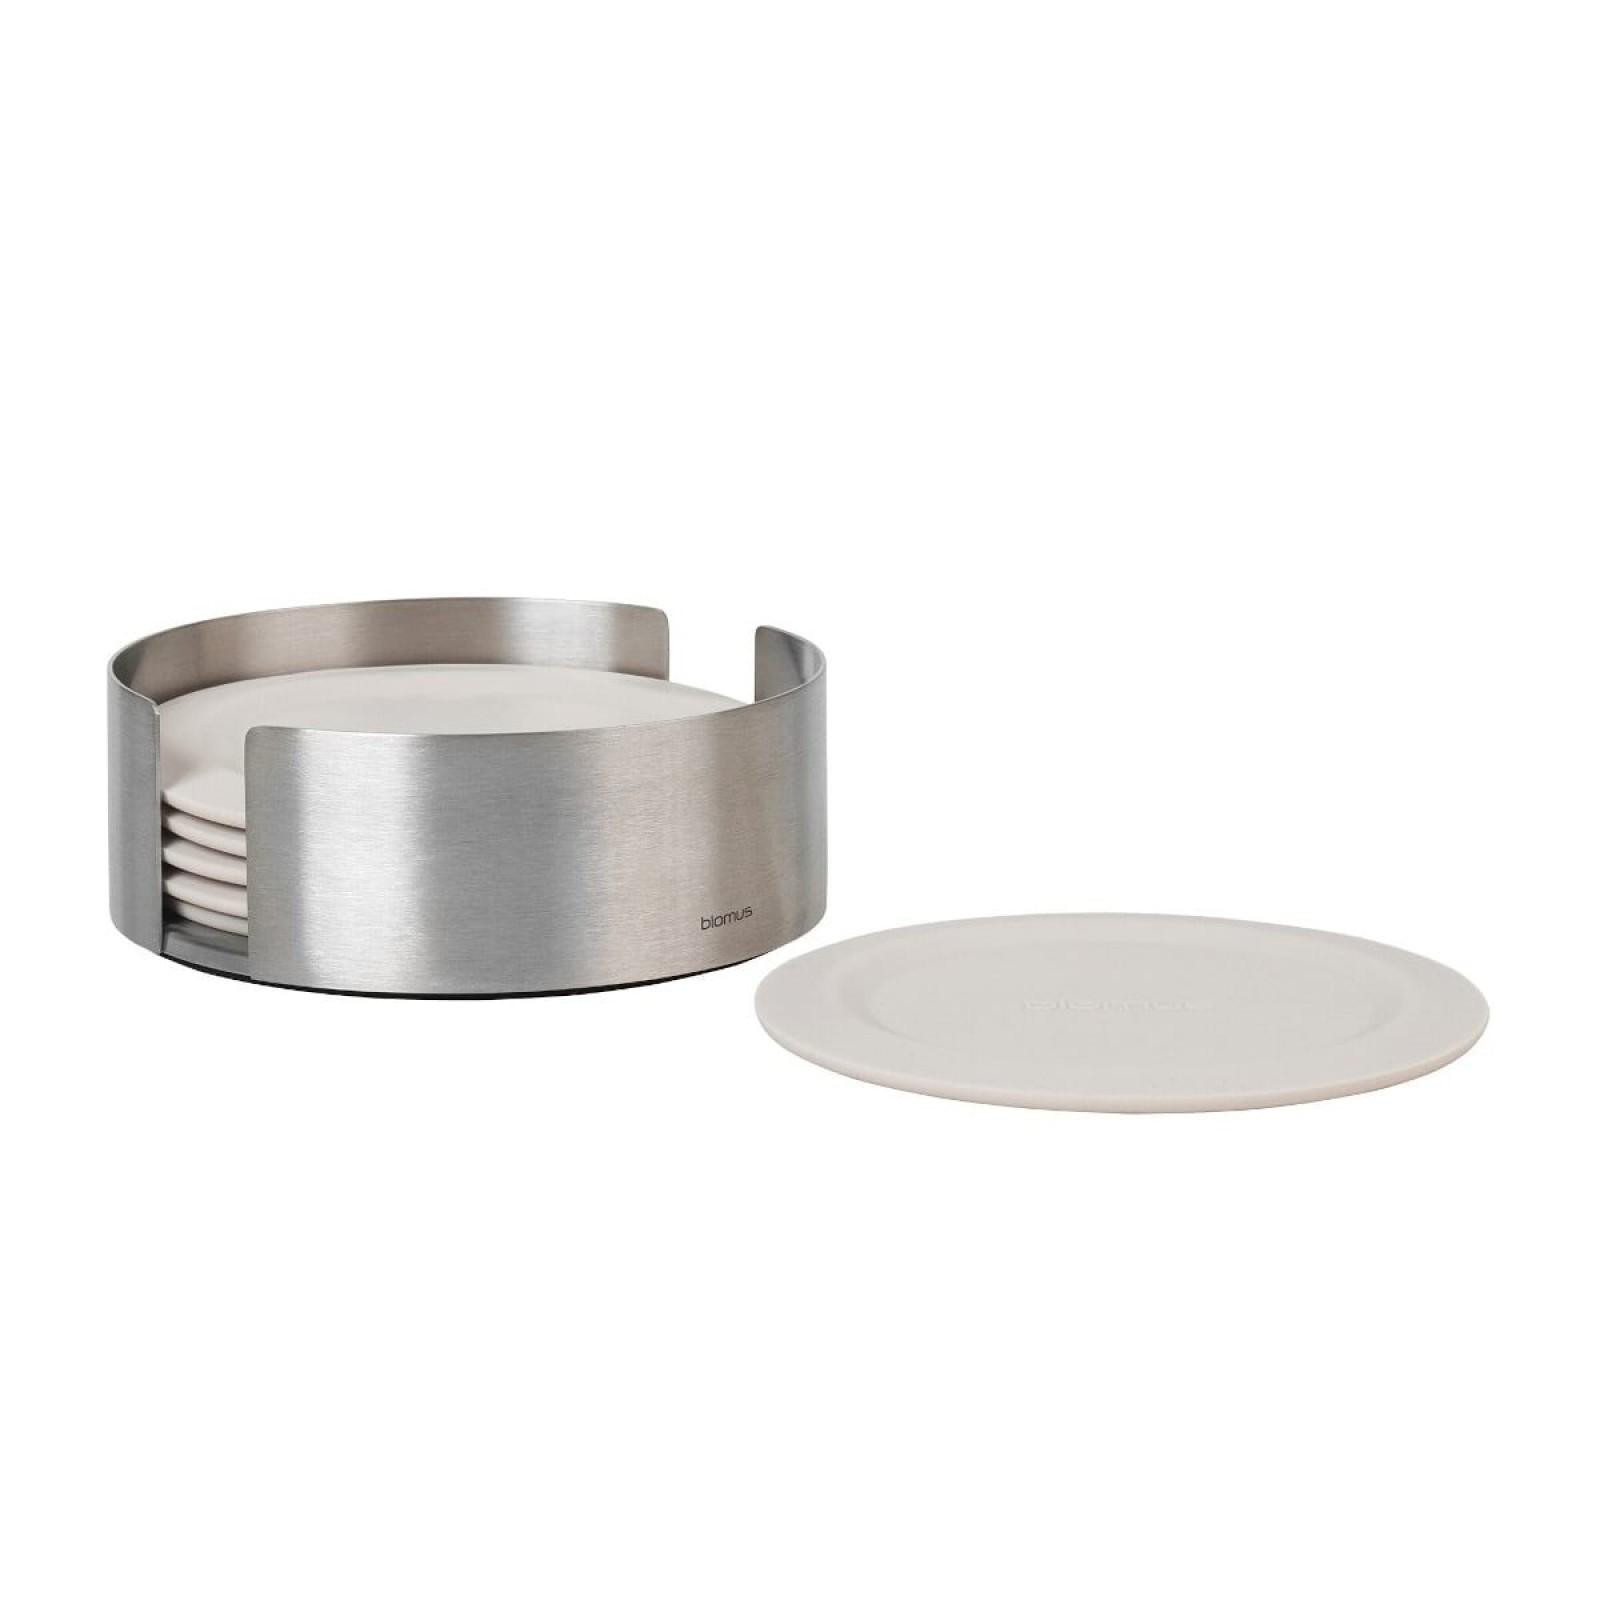 LARETO Round Coasters with Steel Holder Set of 6 (Moonbeam) - Blomus